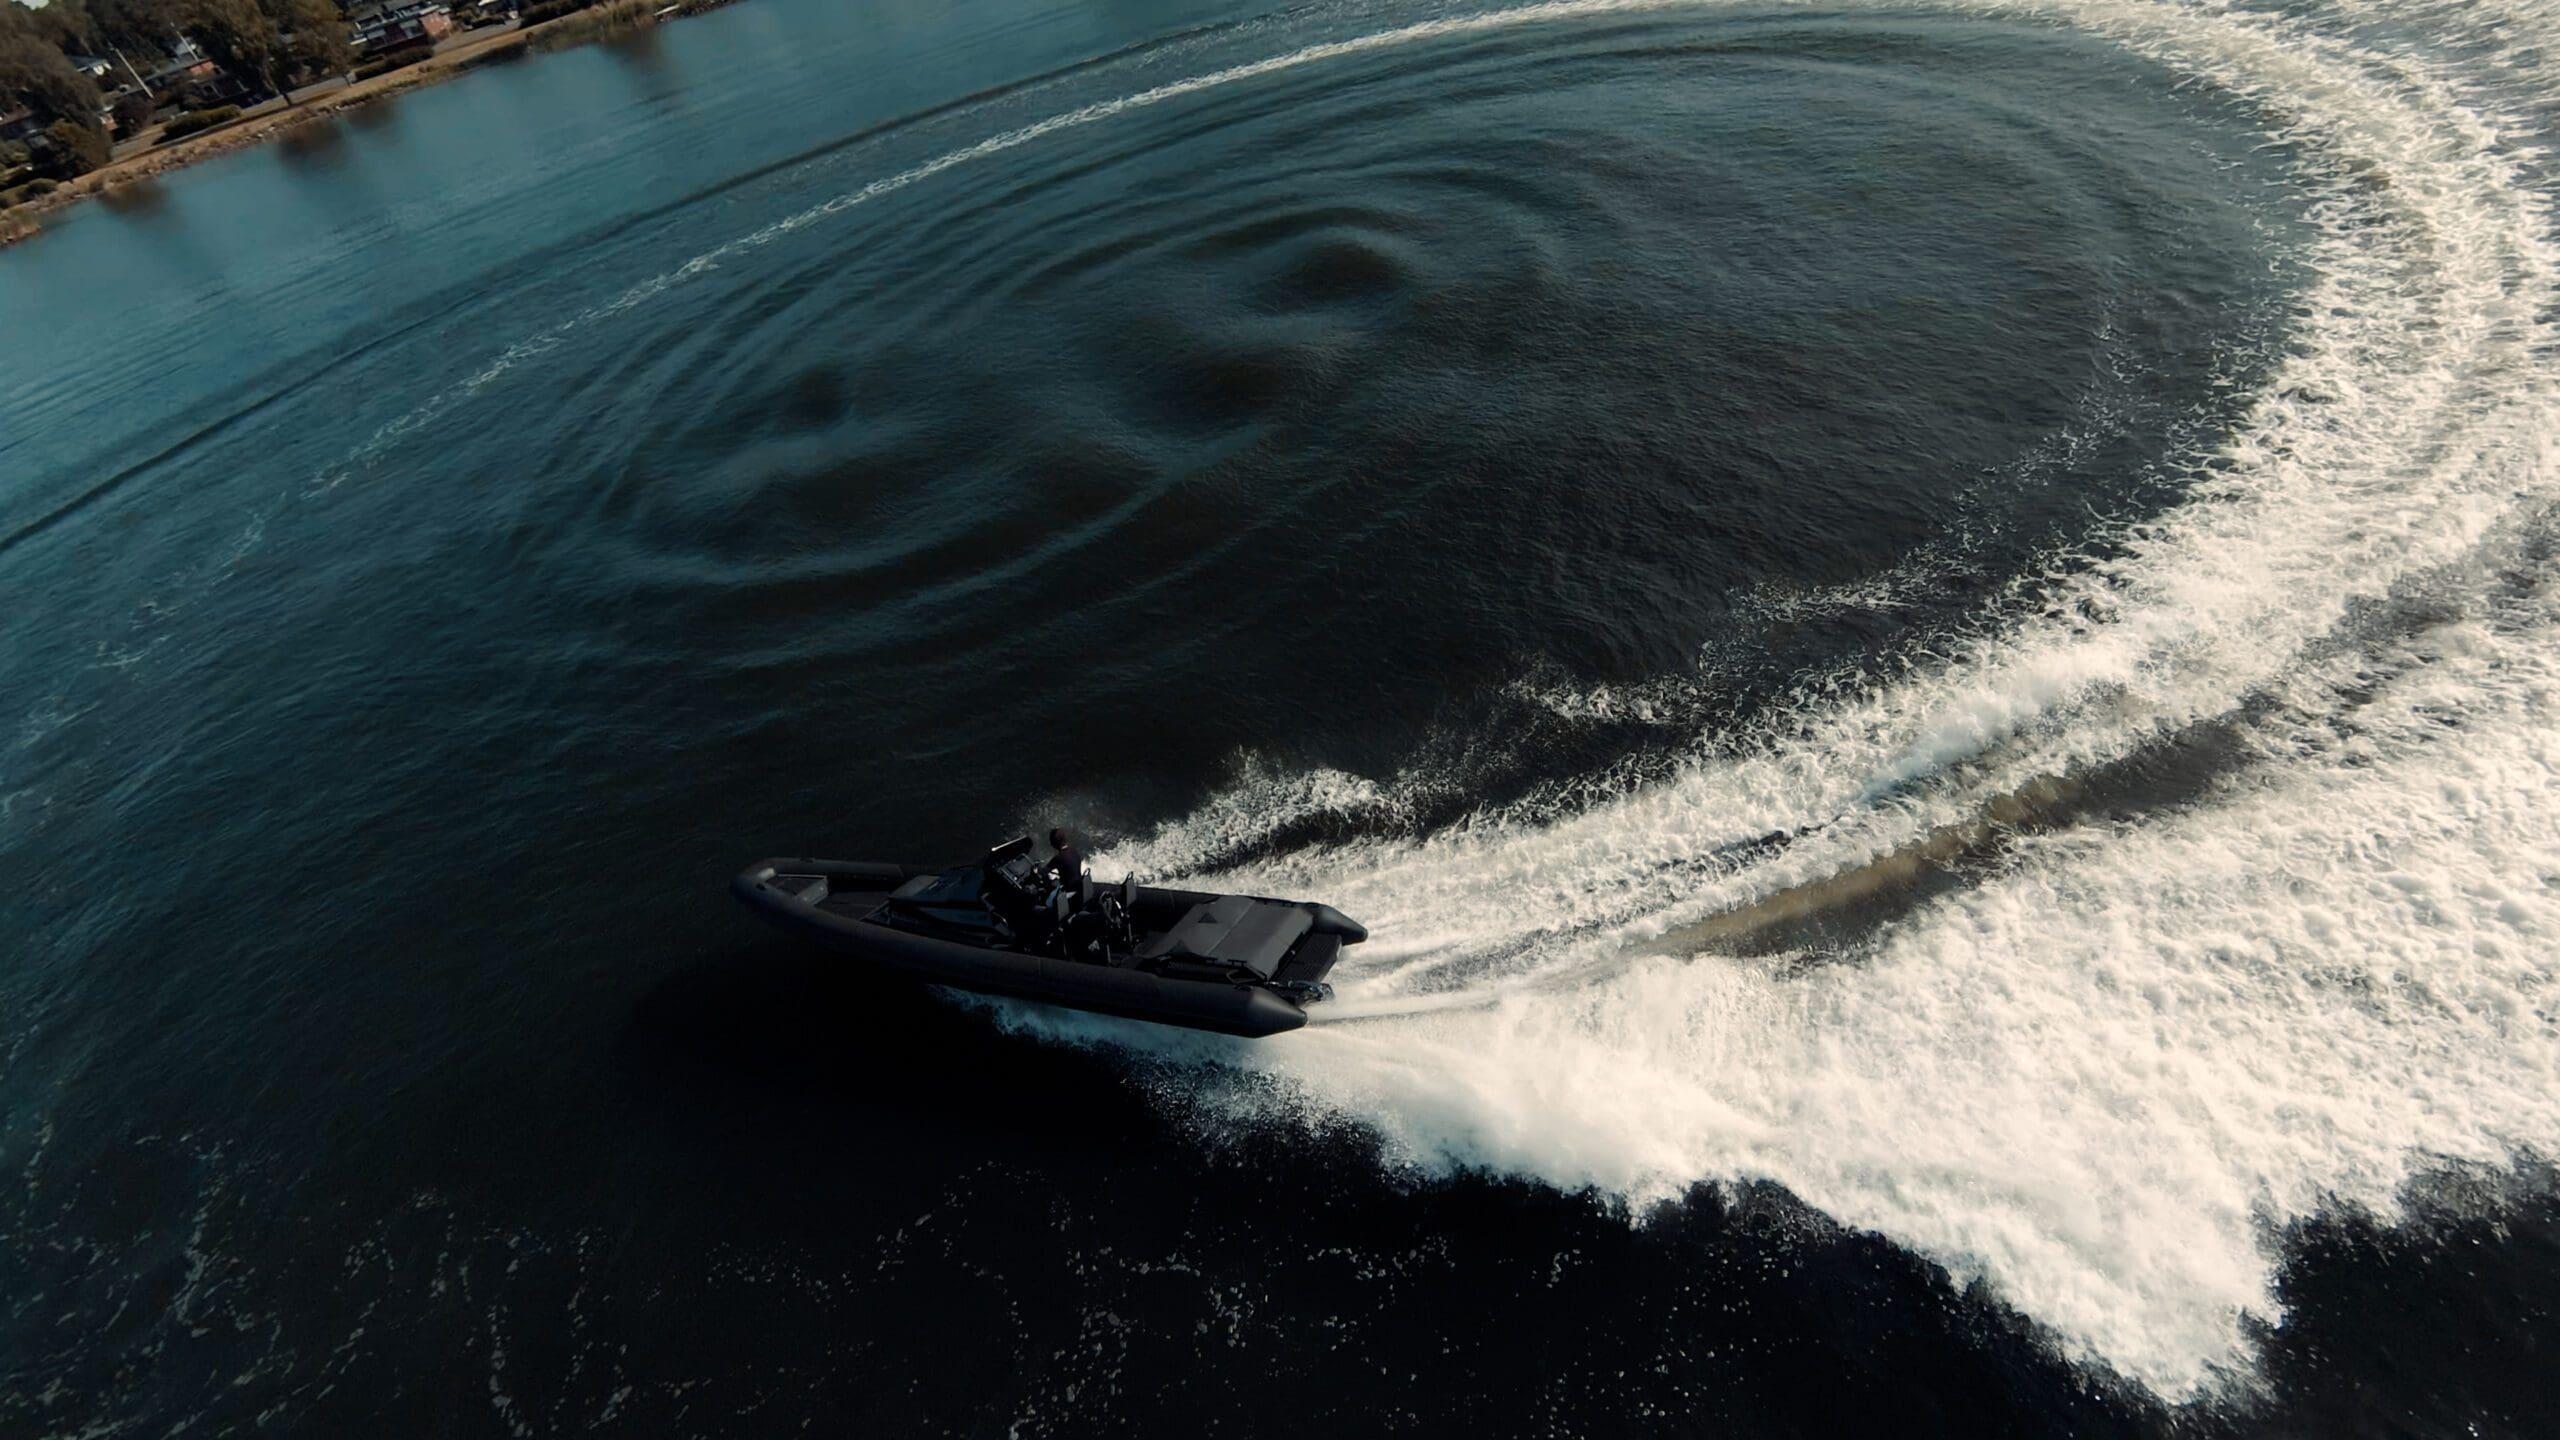 Fugu Powerboats